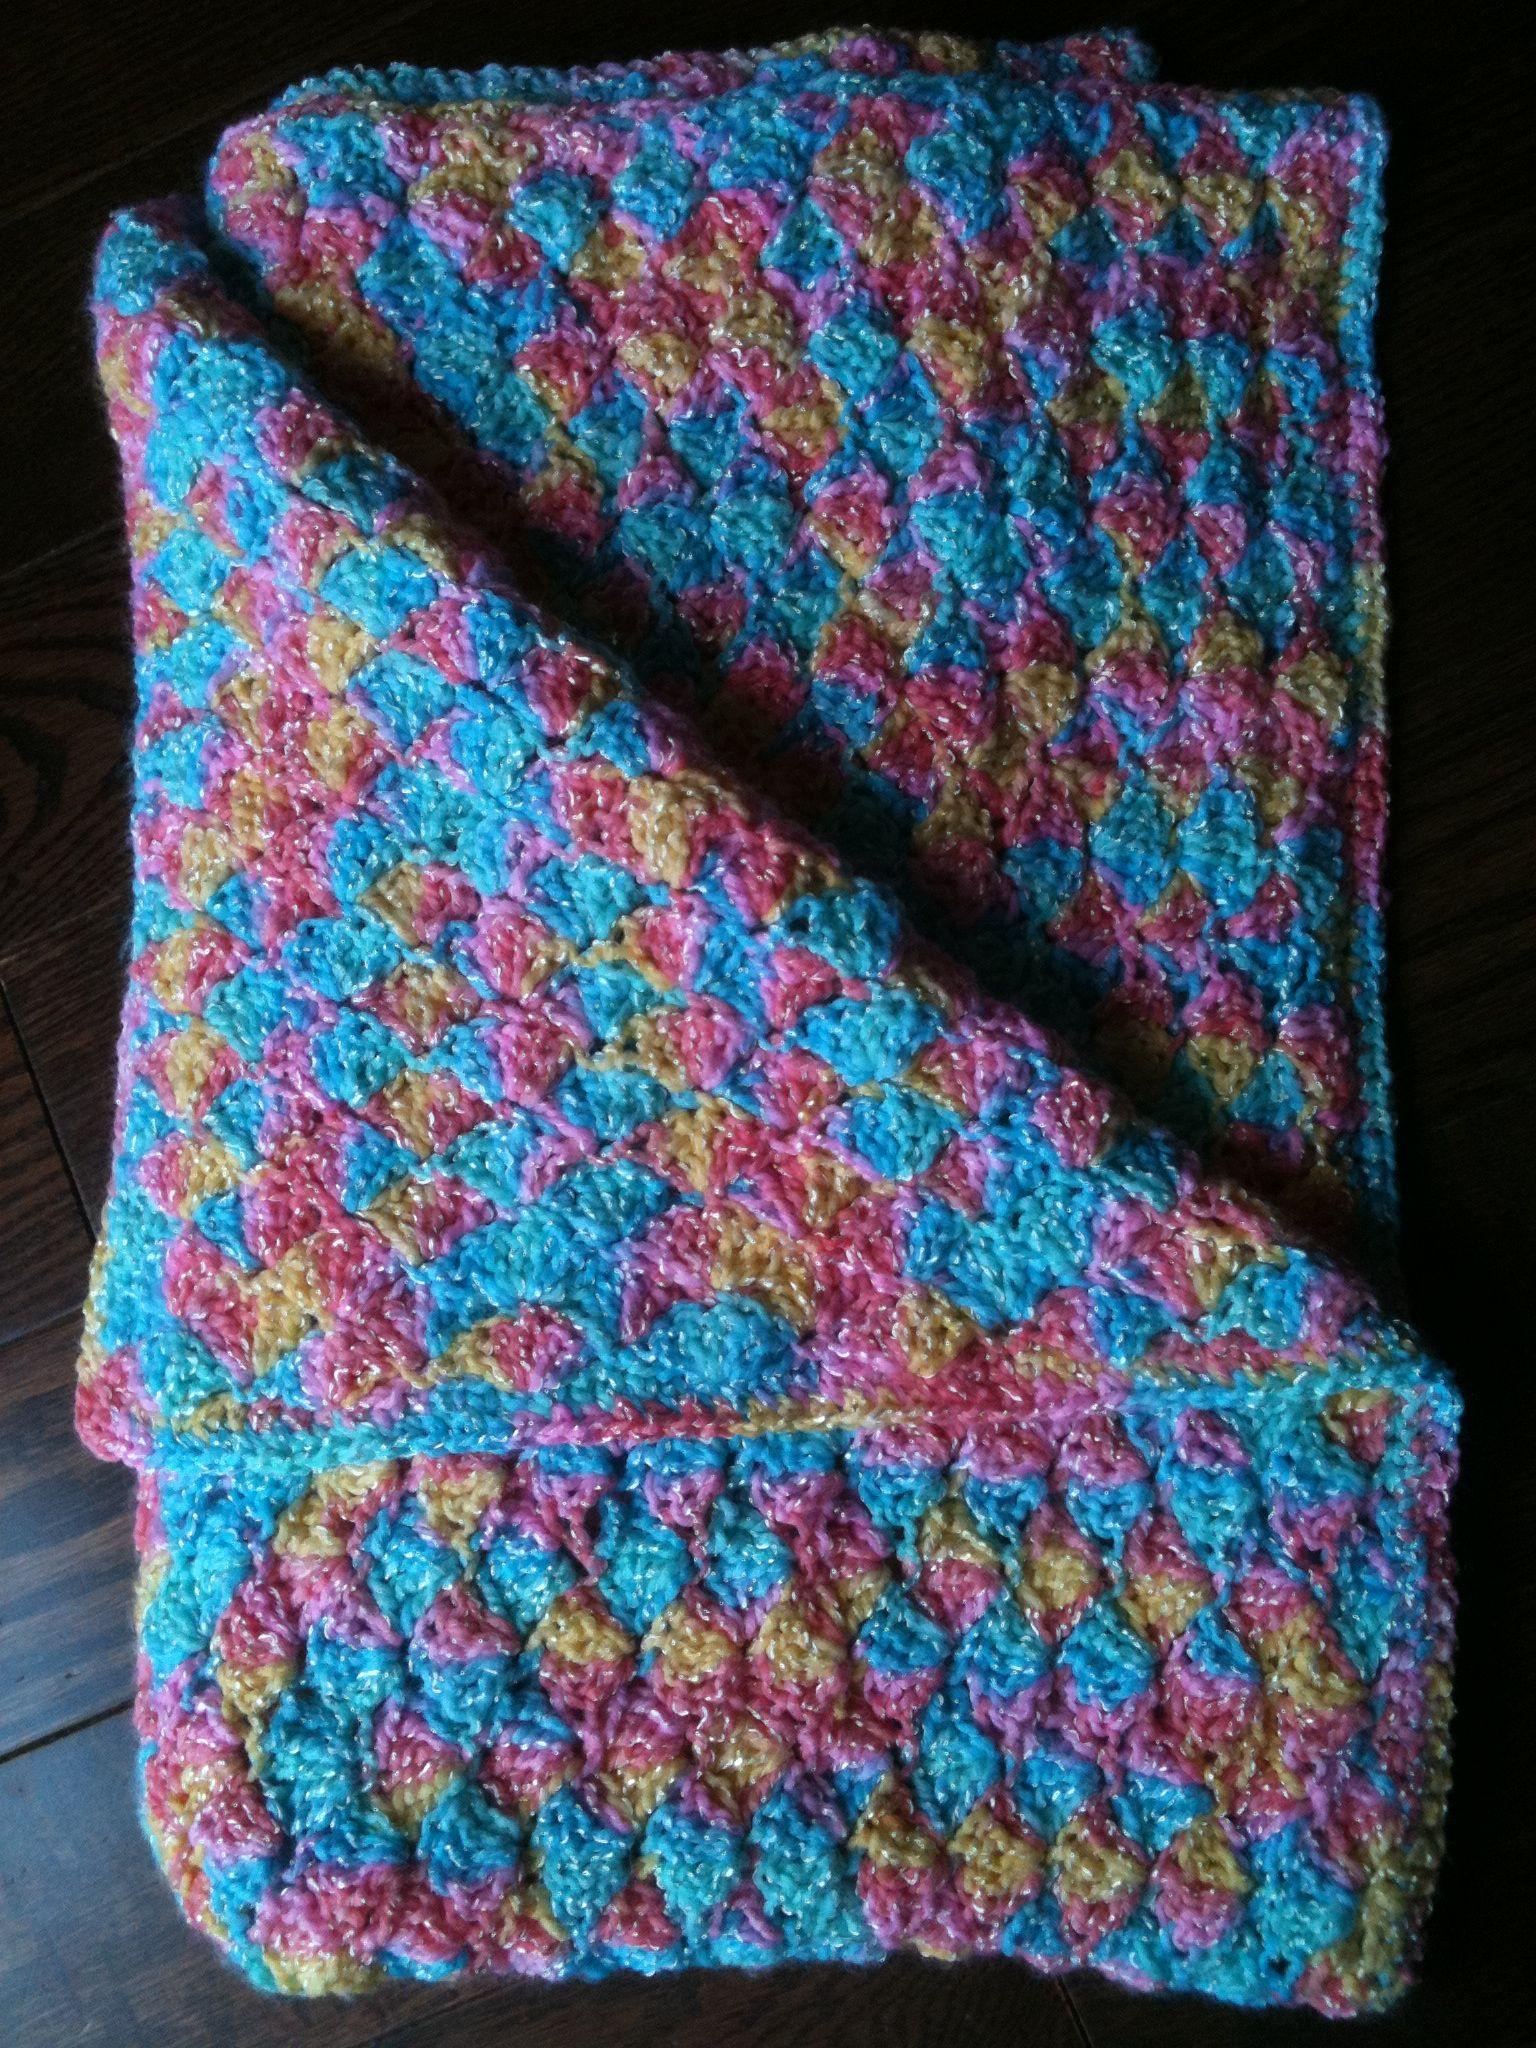 How To Crochet The Rainbow Sherbet Baby Blanket – Cute12